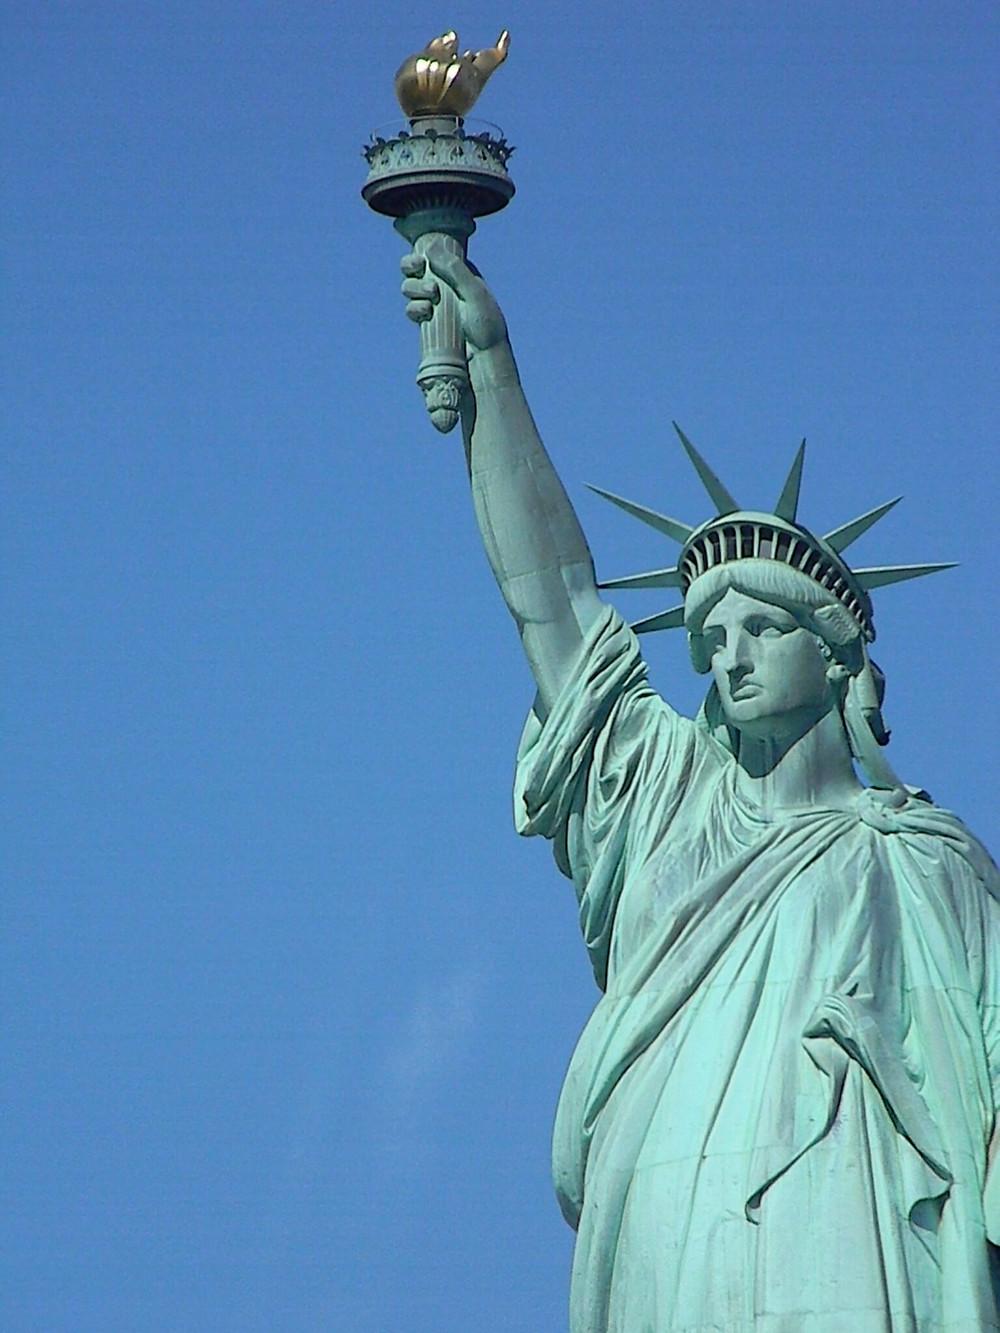 Statue of Liberty on Liberty Island, New York